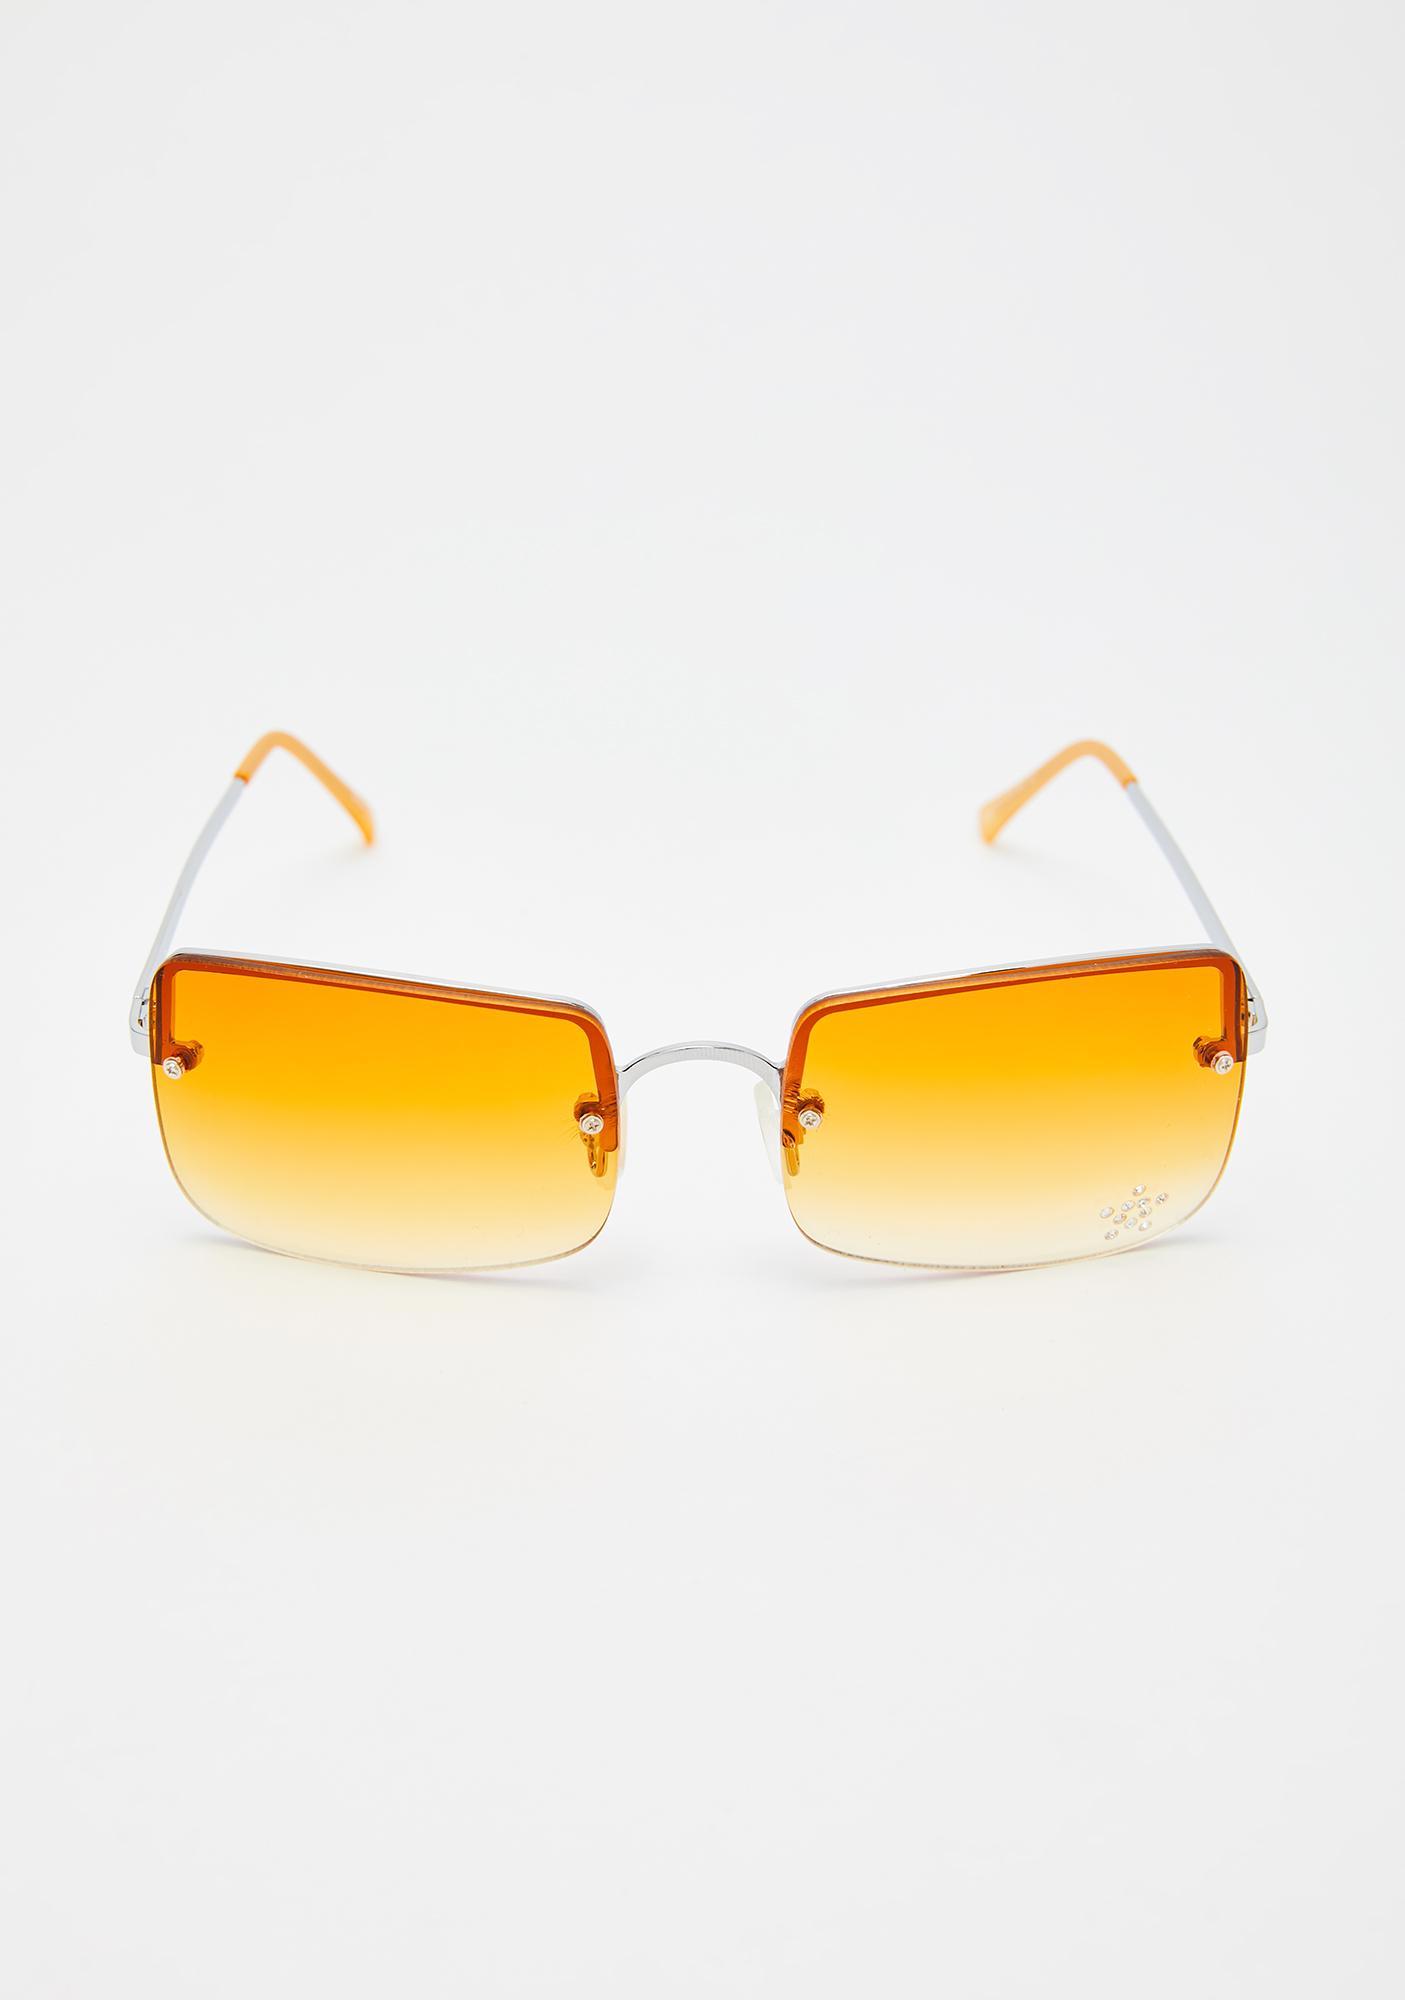 Replay Vintage Sunglasses Sunset Easy Lovin' Square Sunglasses